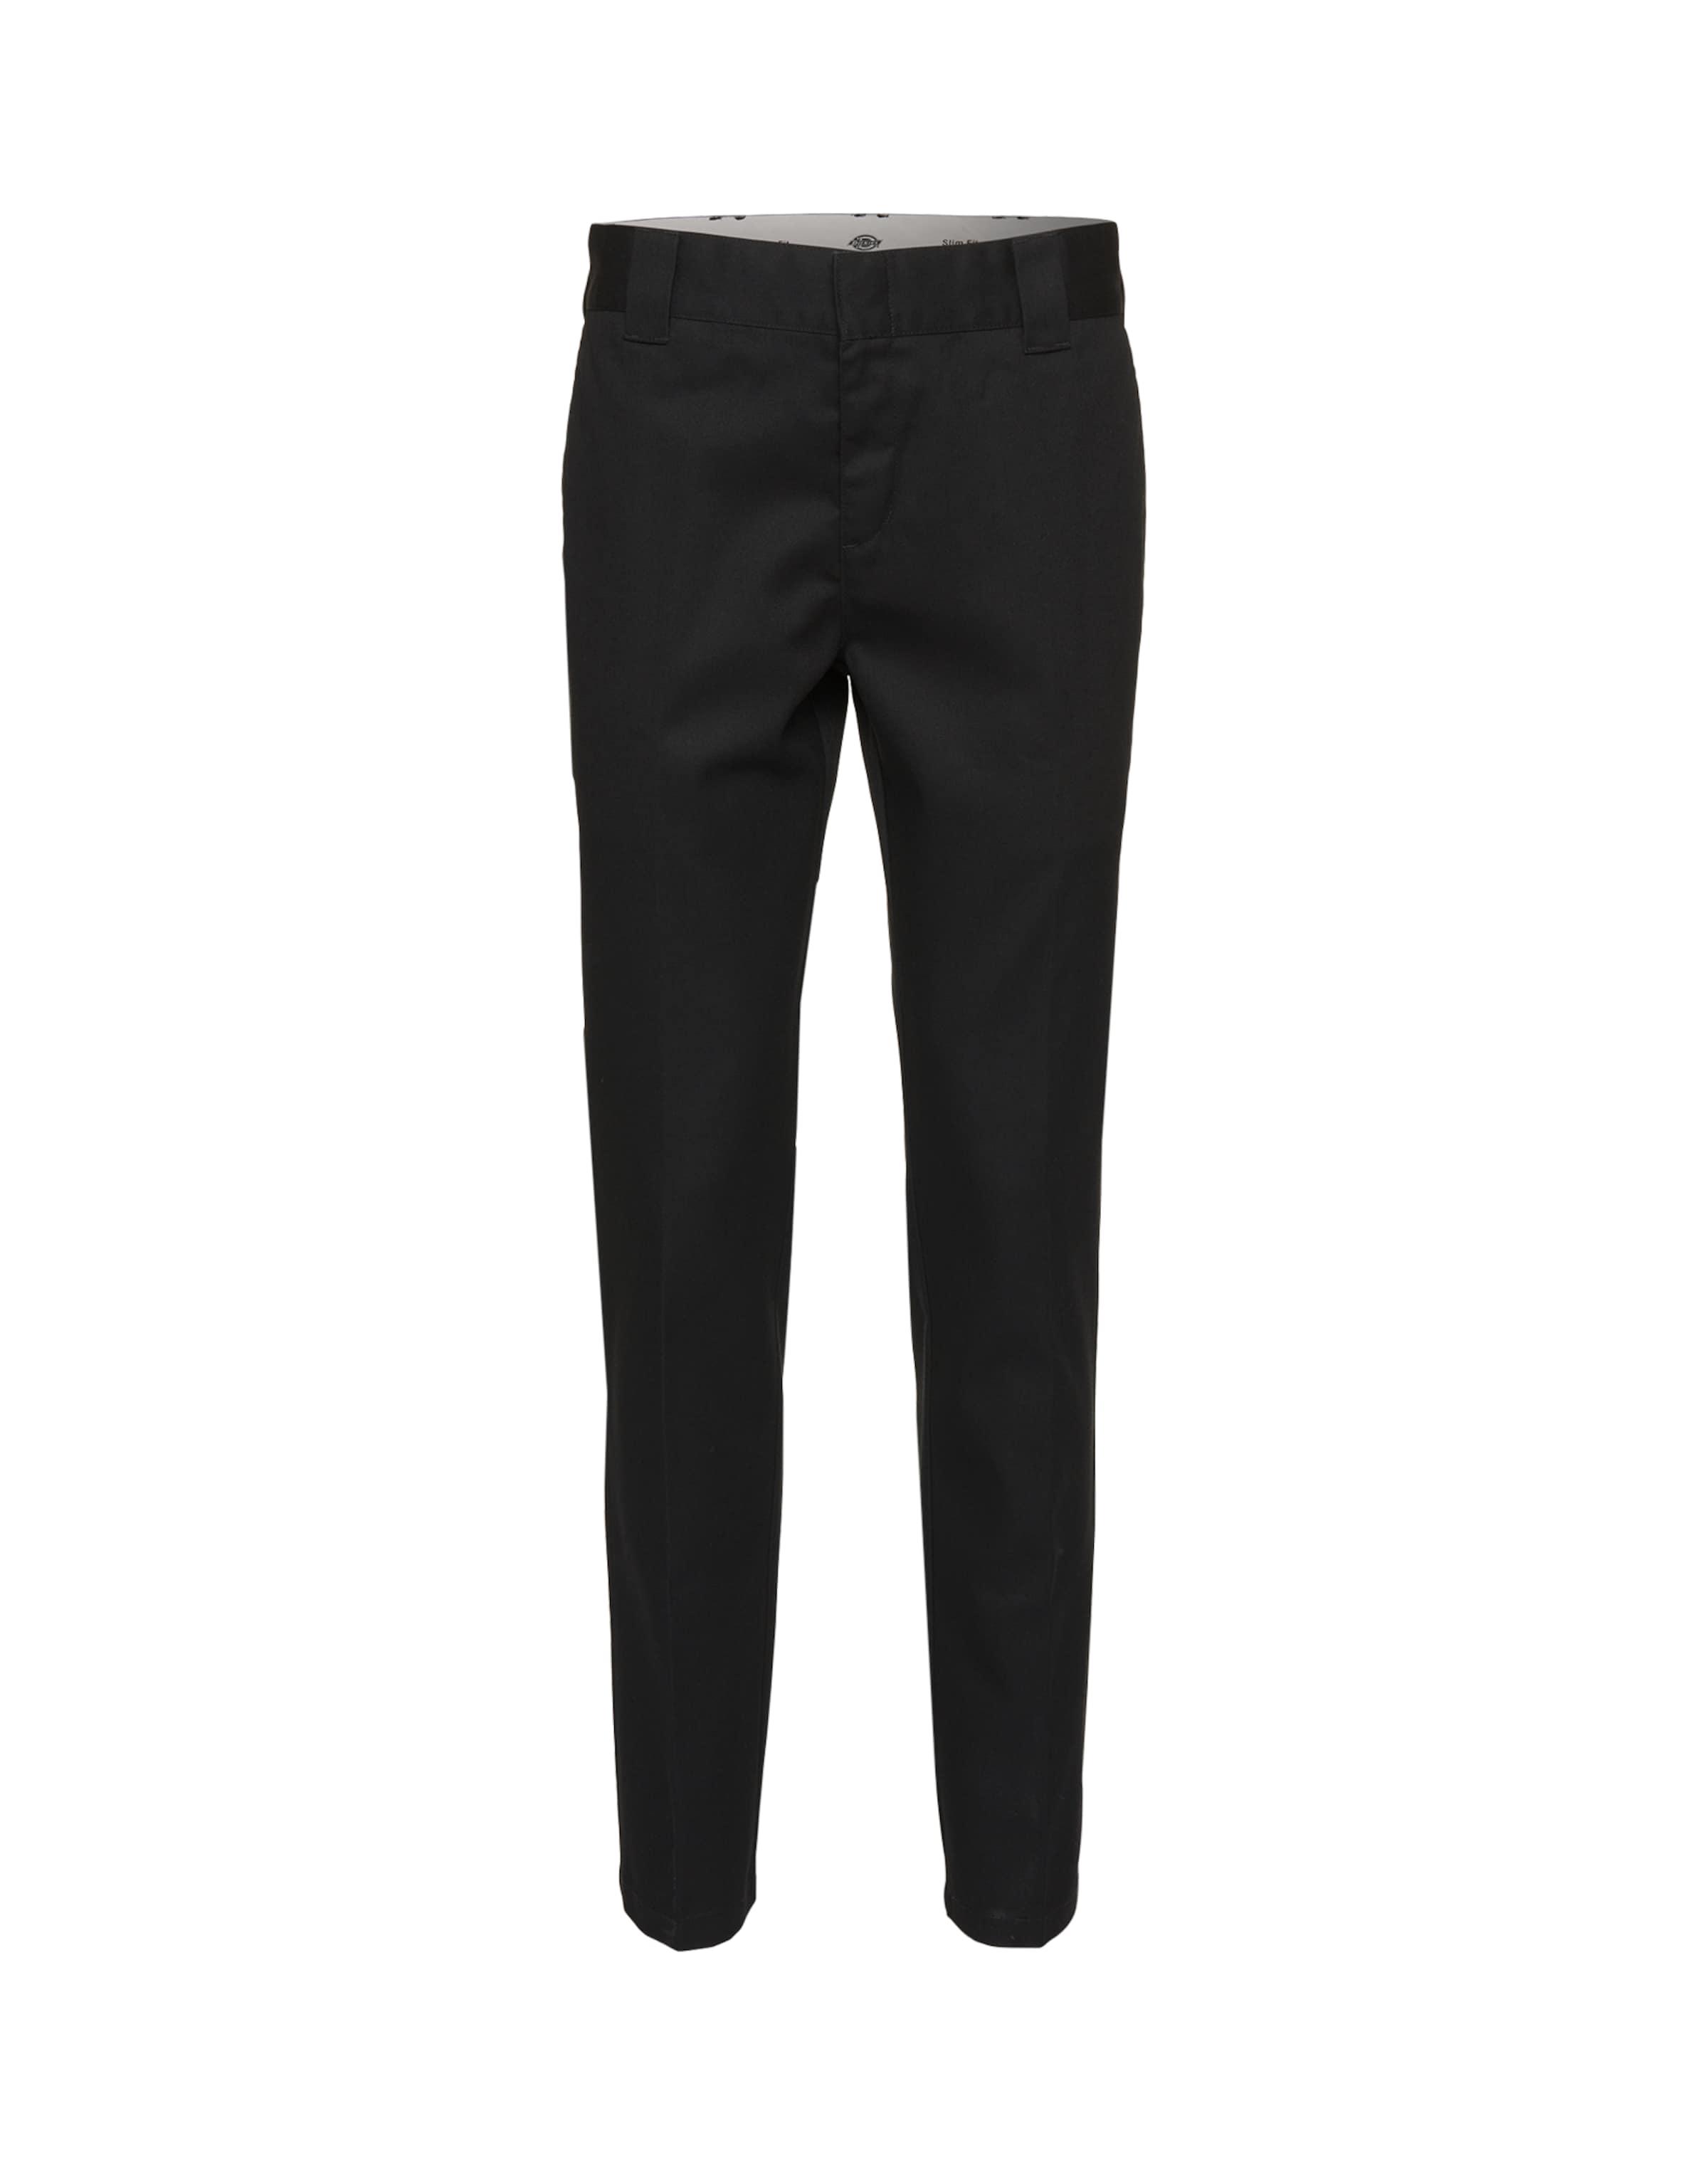 'we872' Pantalon Dickies Cognac En Chino wN8m0n